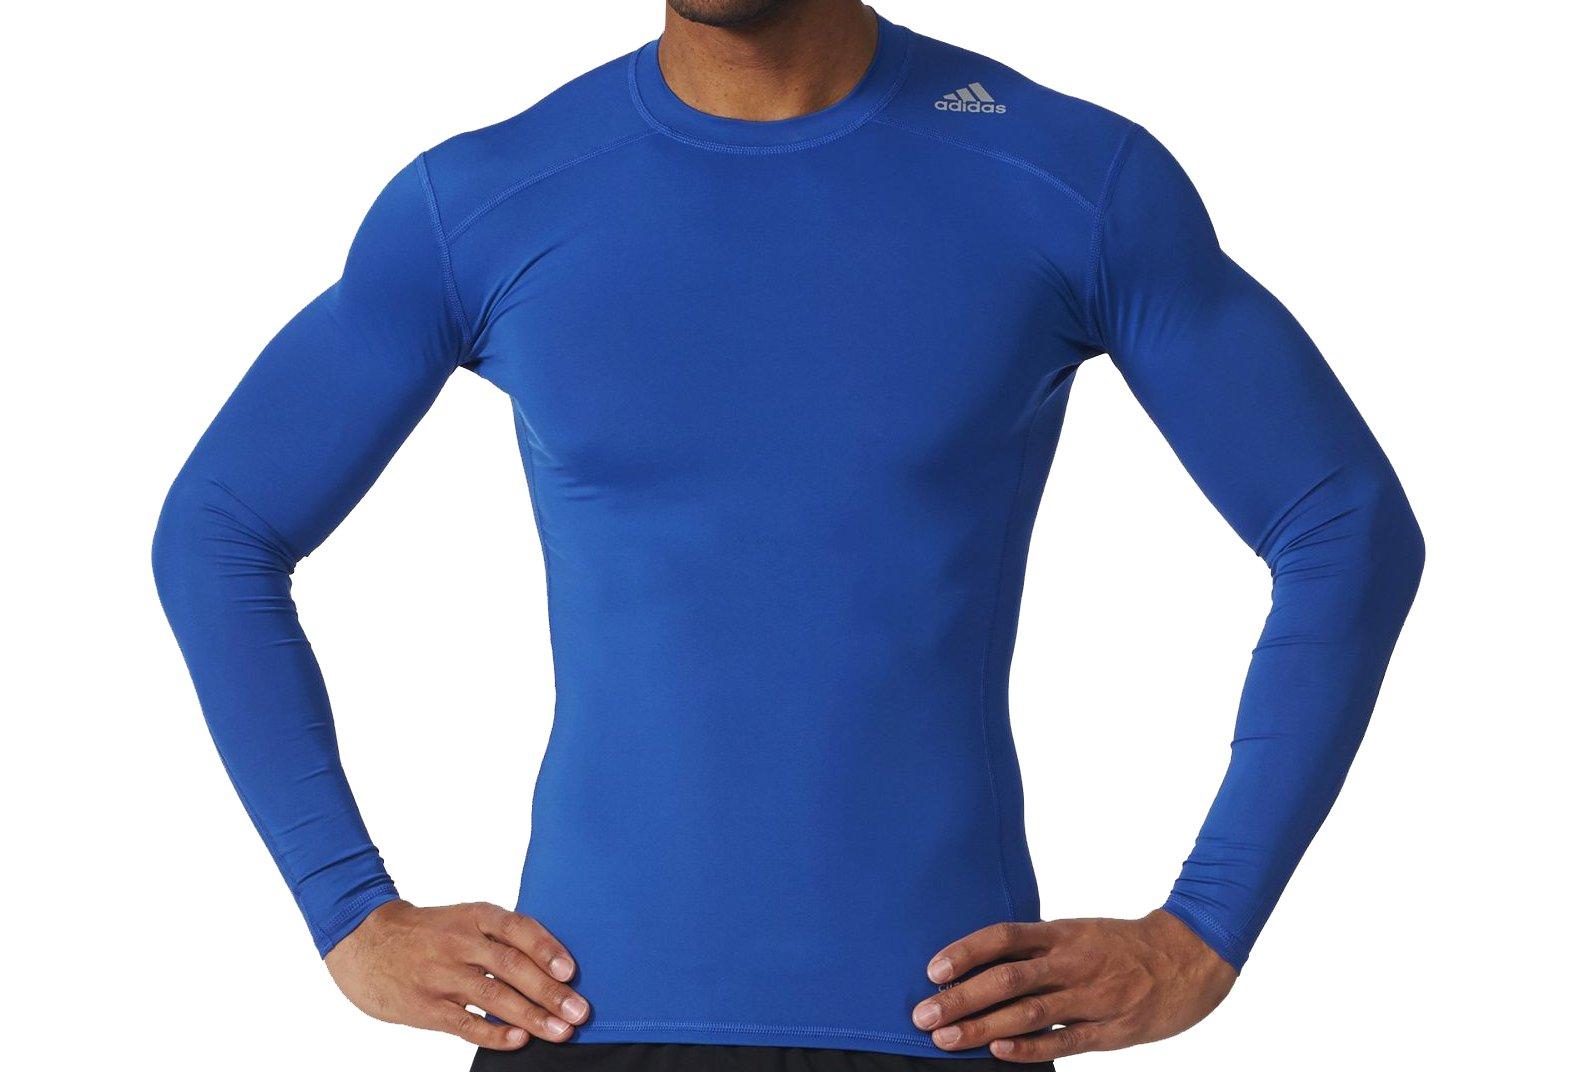 T-tričko adidas TechFit technické termoaktywna S